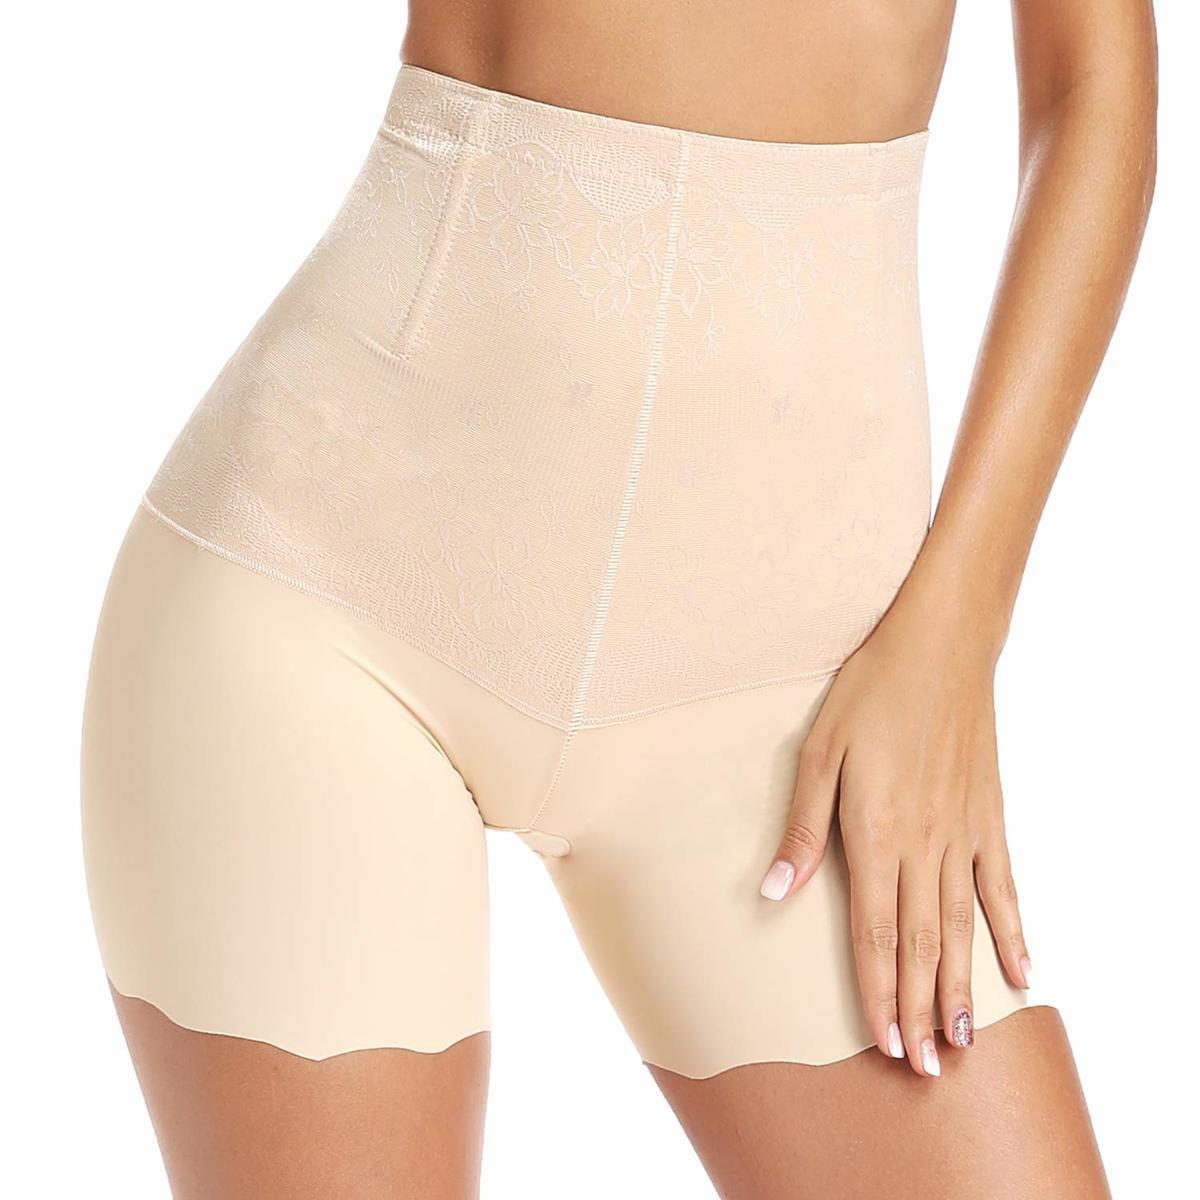 Cintura alta Corpo Shaper Mulheres Underwear cintura instrutor Segurança curto Pants Bundas Lifter Shapewear Tummy Controle Cinturão Sexy Lingerie